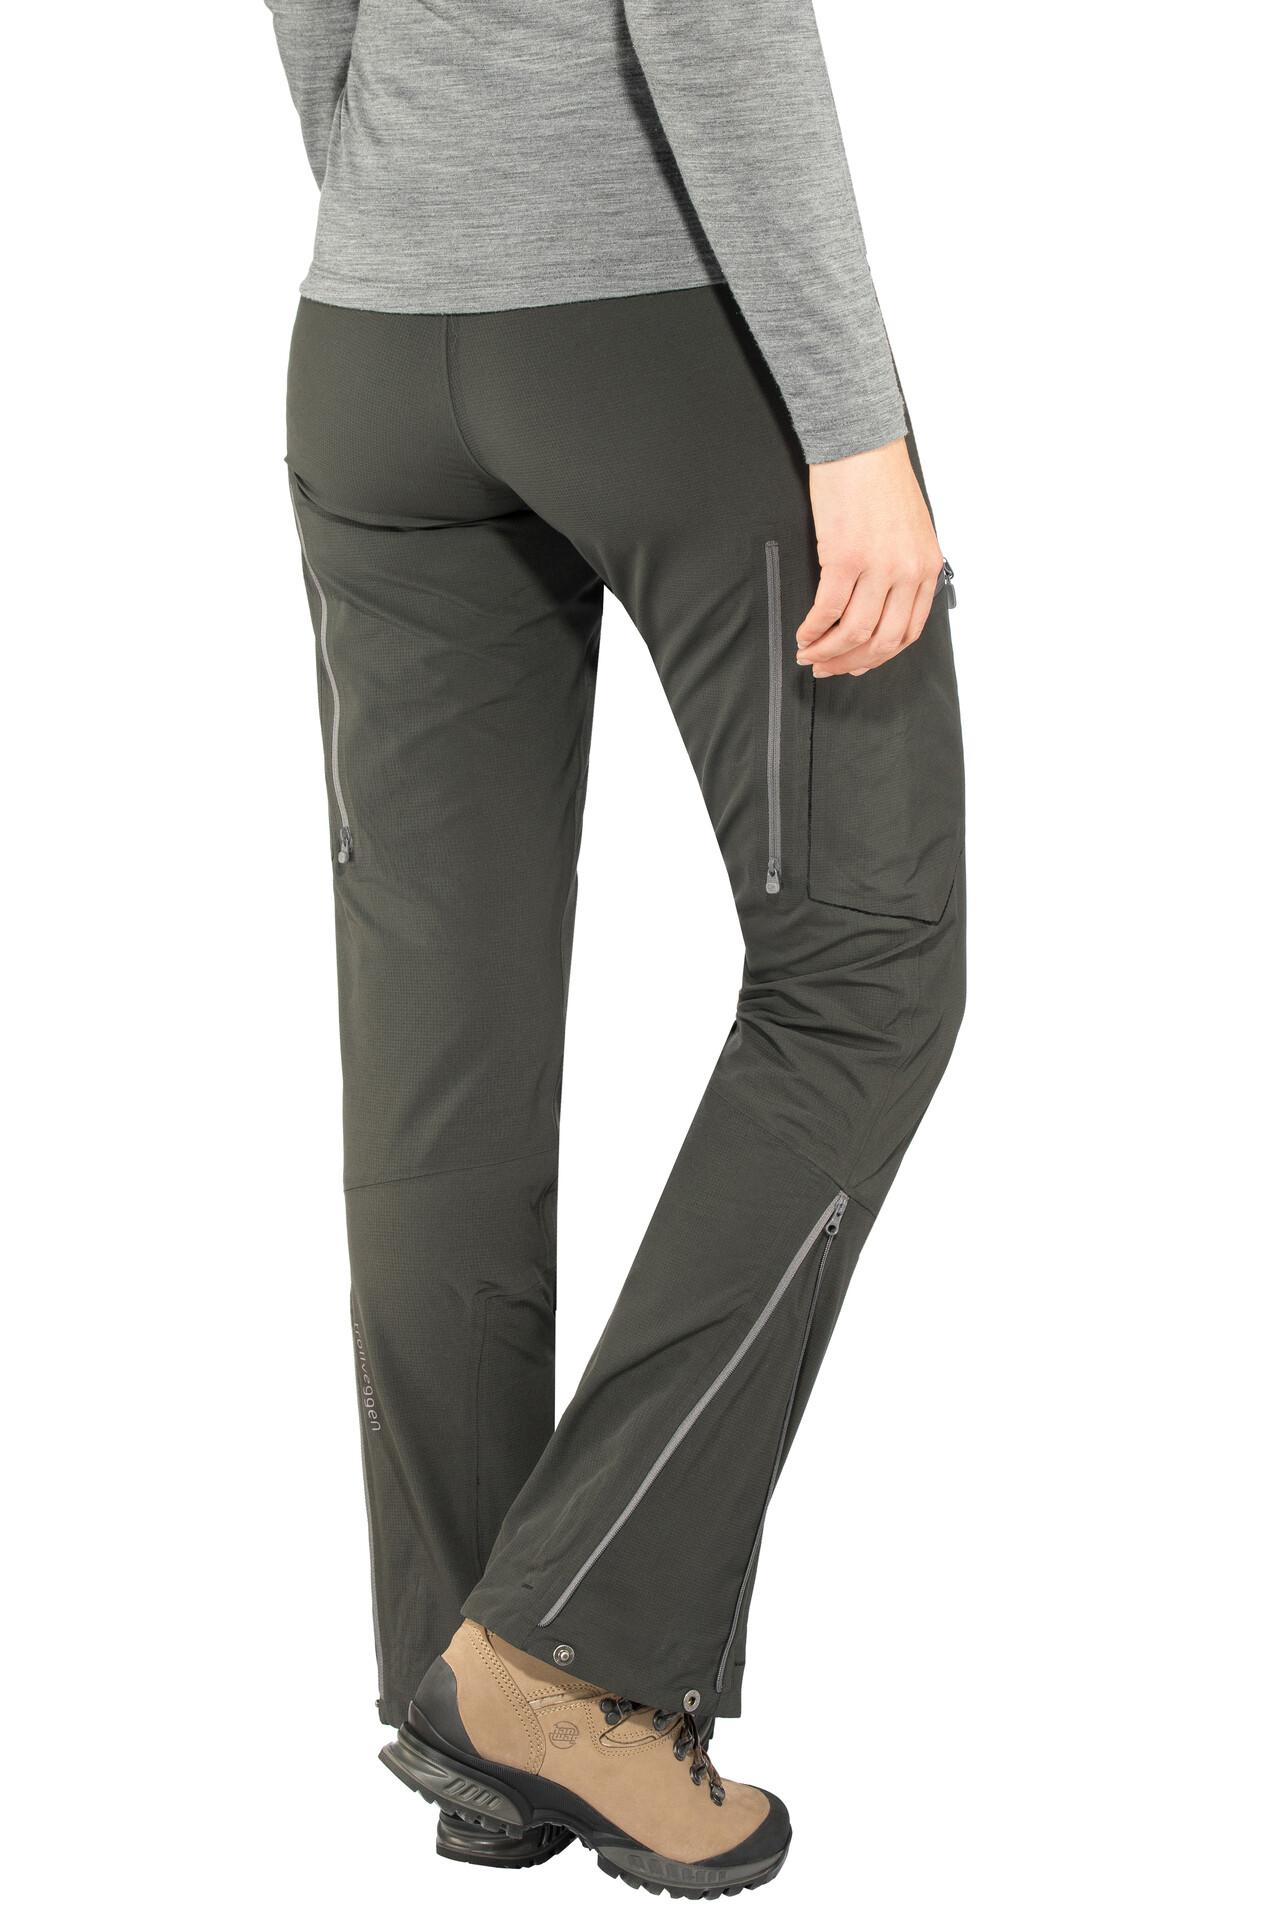 Norrona trollveggen flex1 Pants (W) Naisten vaatteet